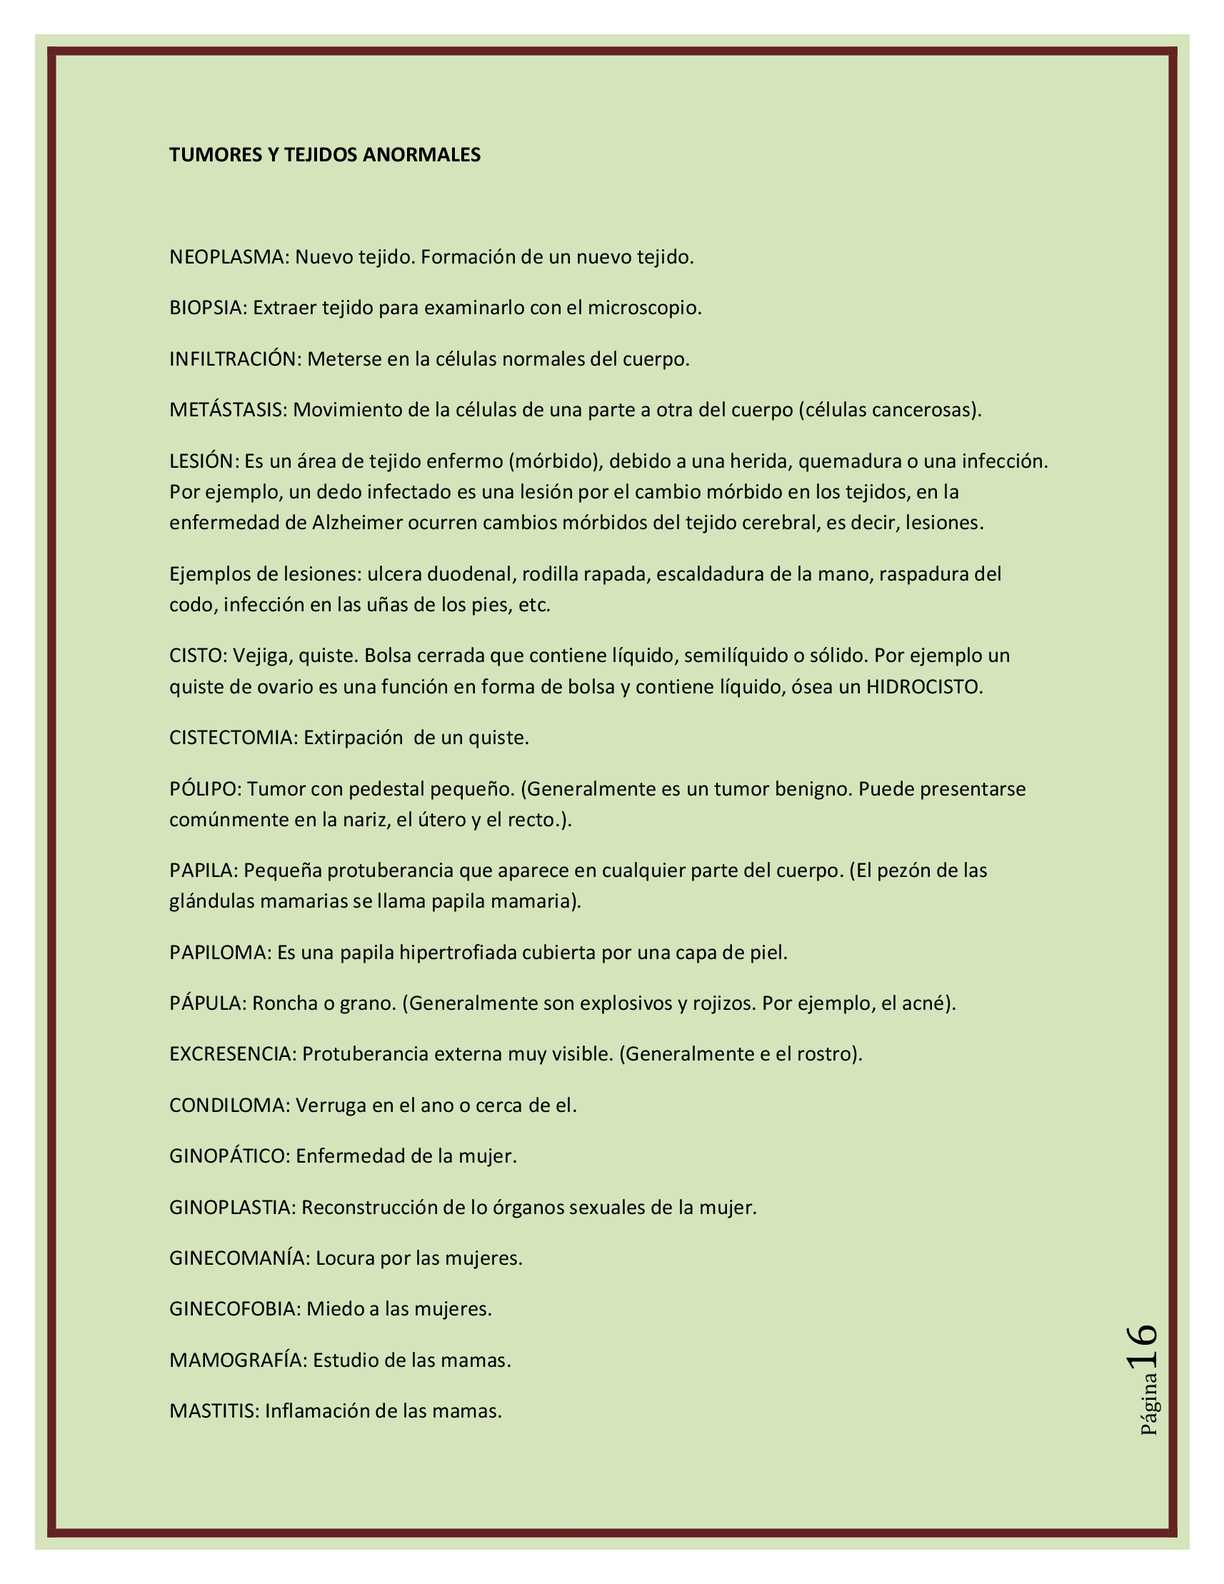 LIBRO DE CONSULTA TERMINOLOGIA MEDICA - CALAMEO Downloader